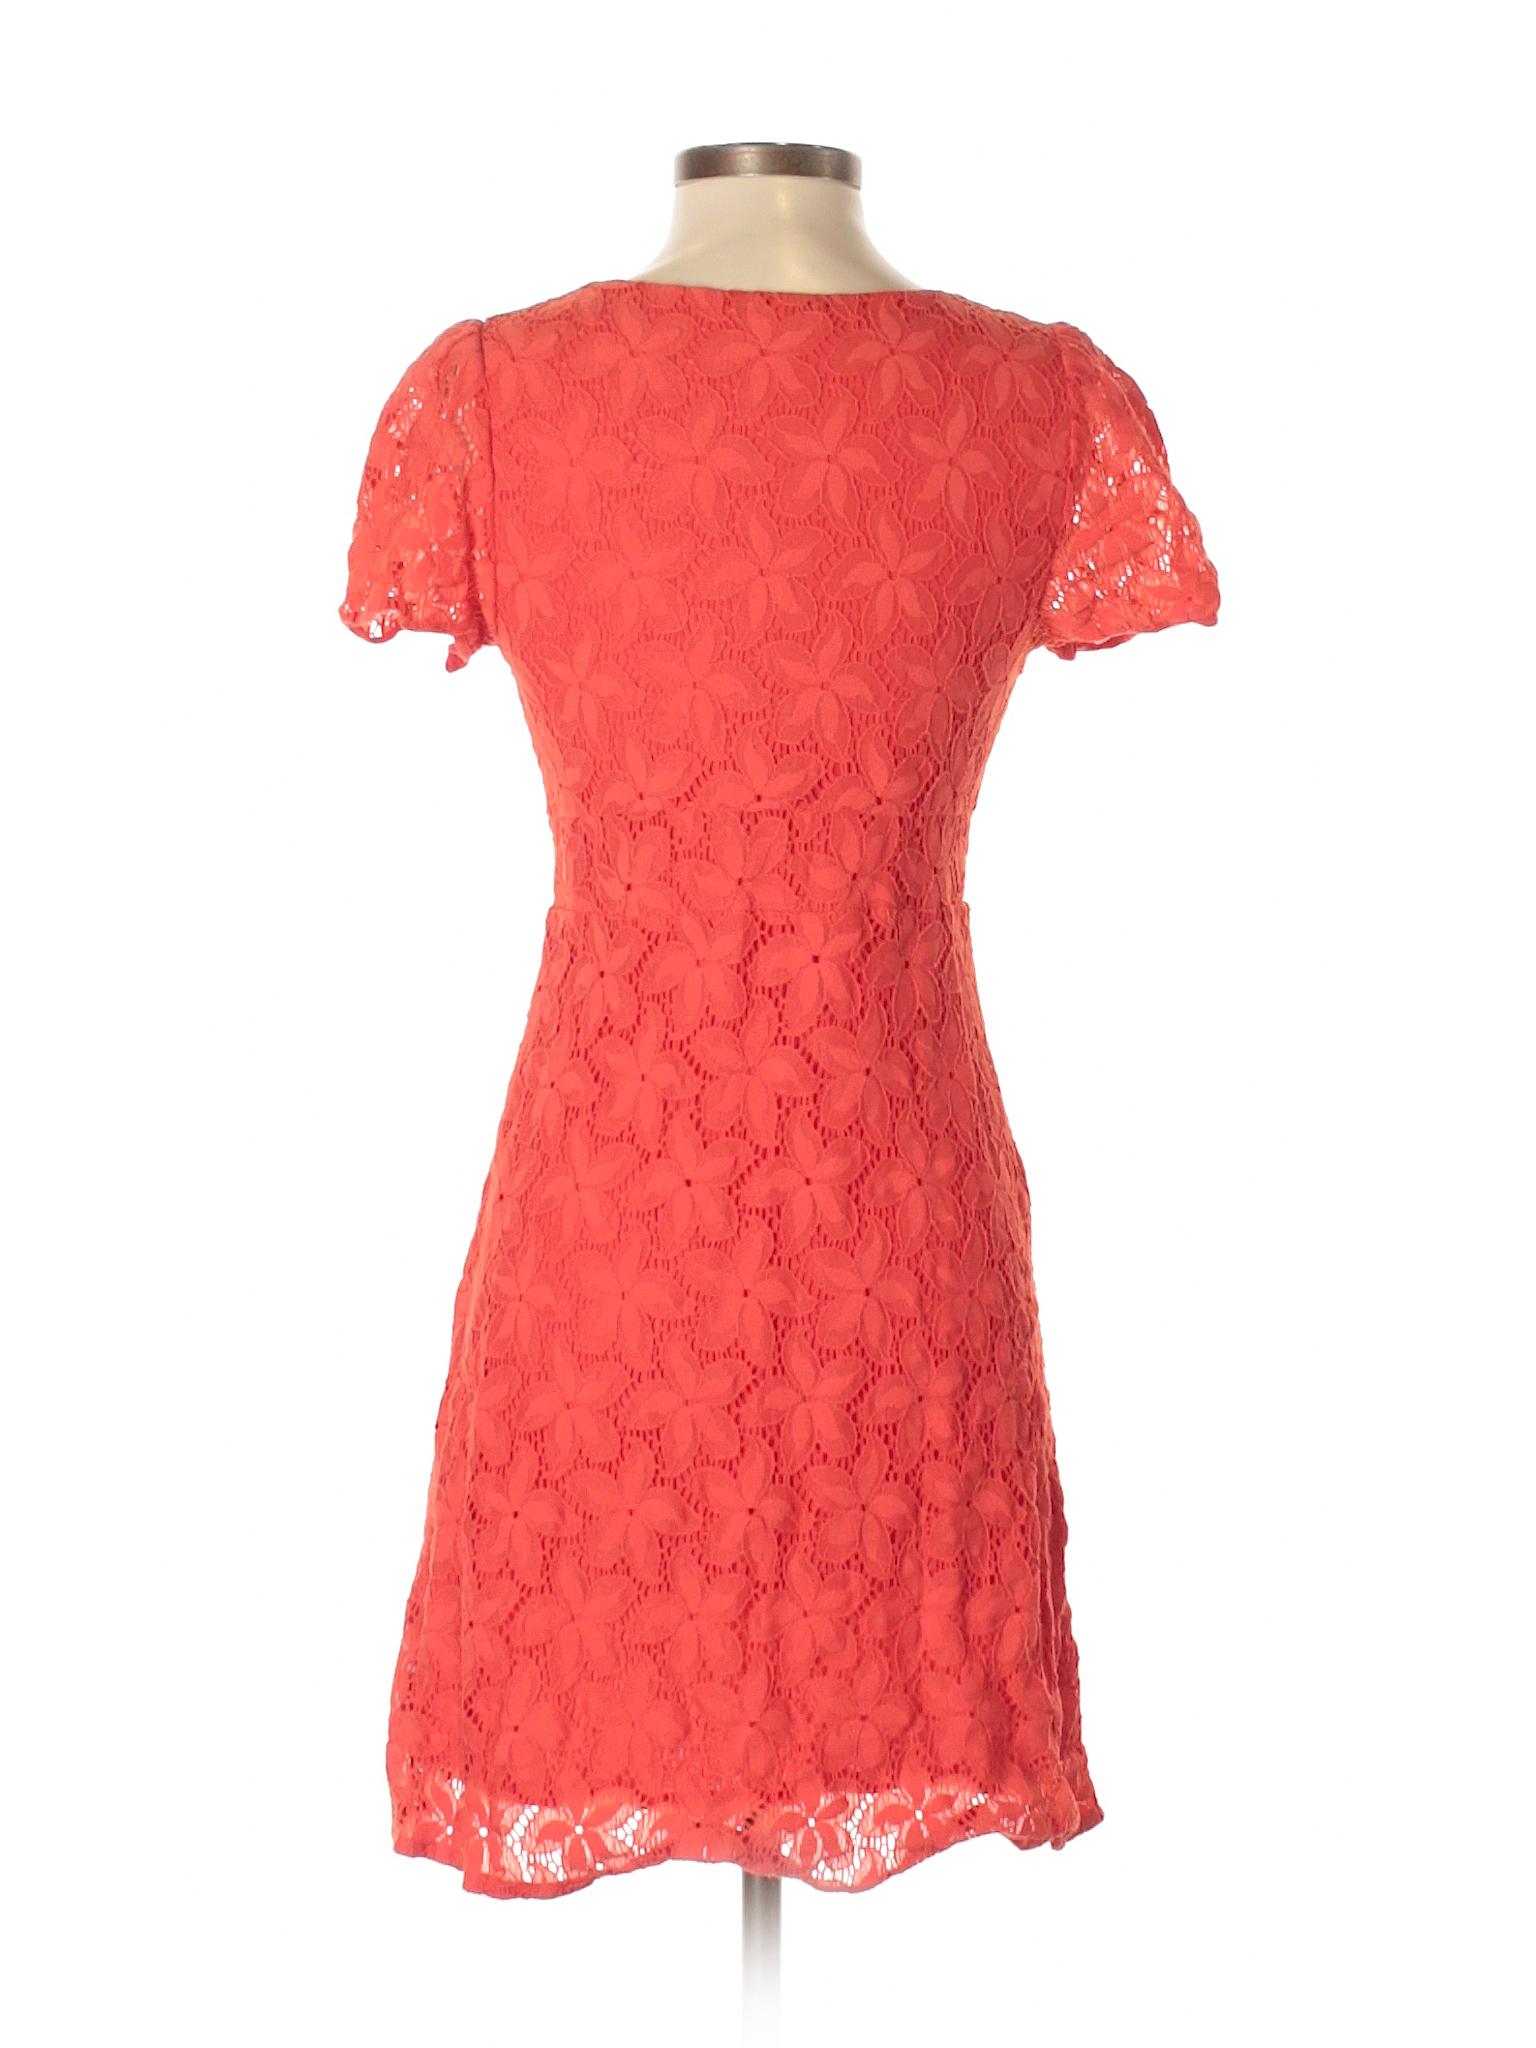 Dress Leif Casual Boutique winter Notes H1fqZ7a